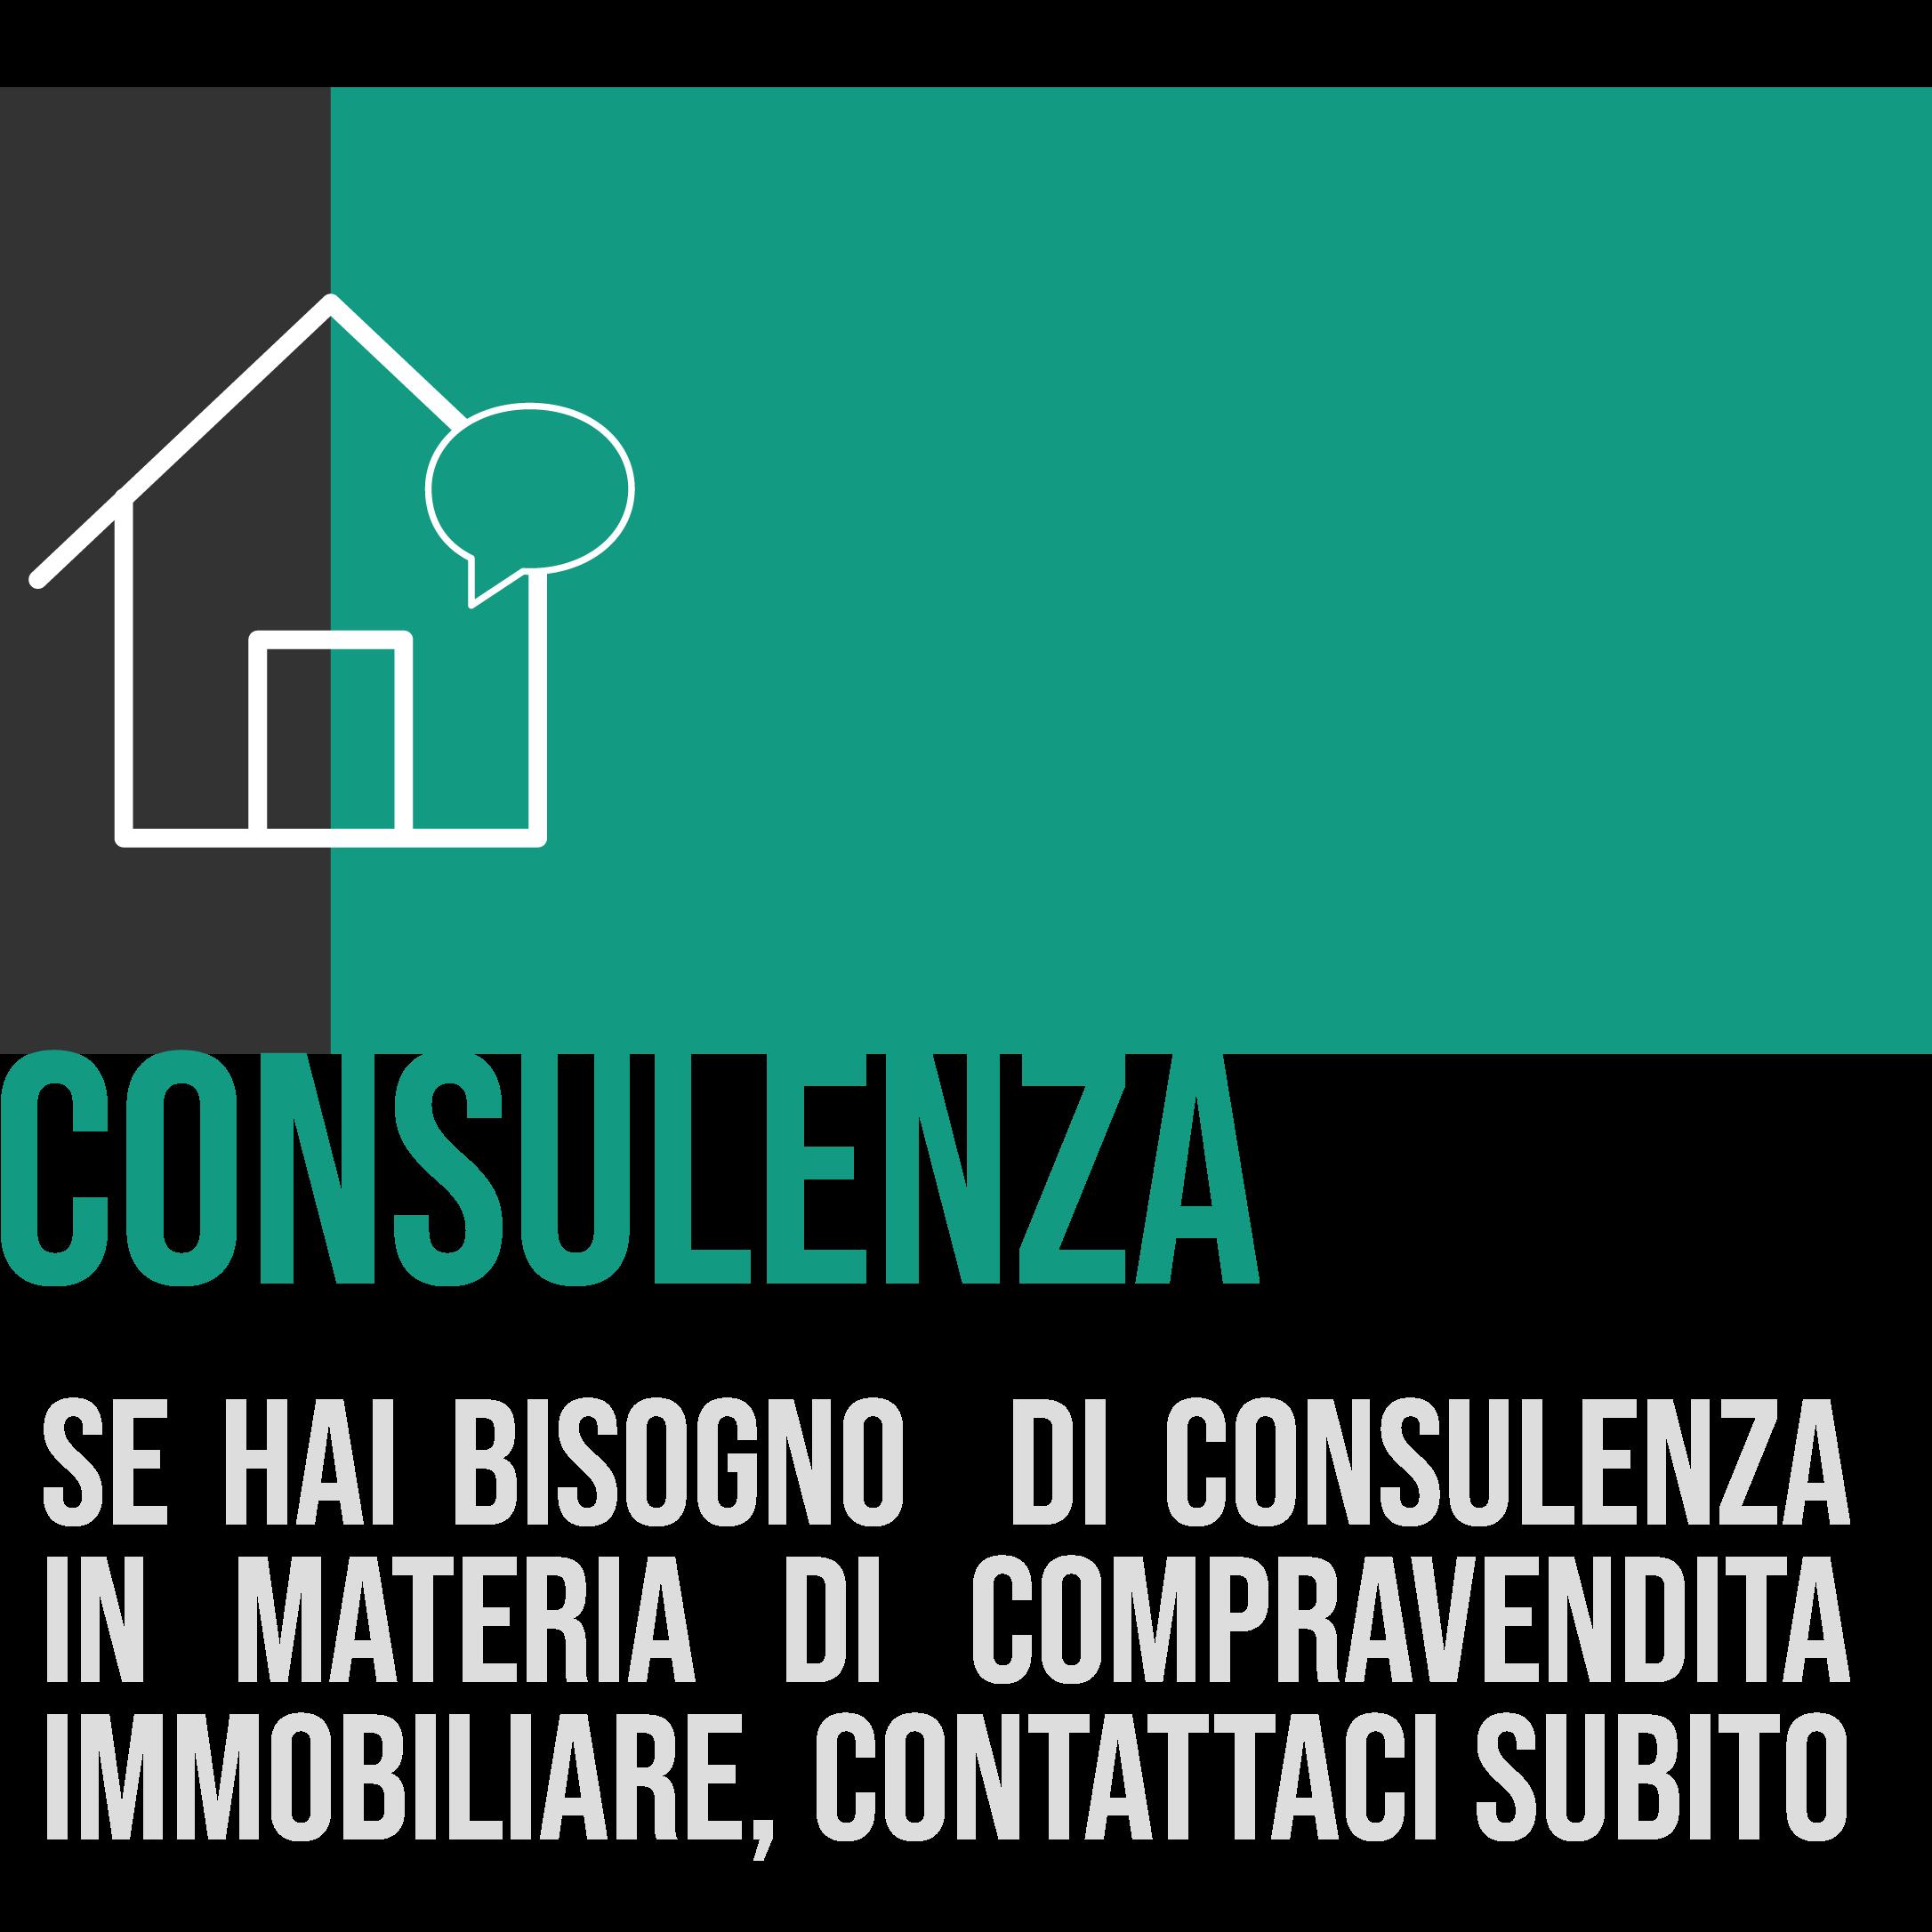 Servizi Per Agenti Immobiliari kapital servizi immobiliari - agenzia immobiliare a milano